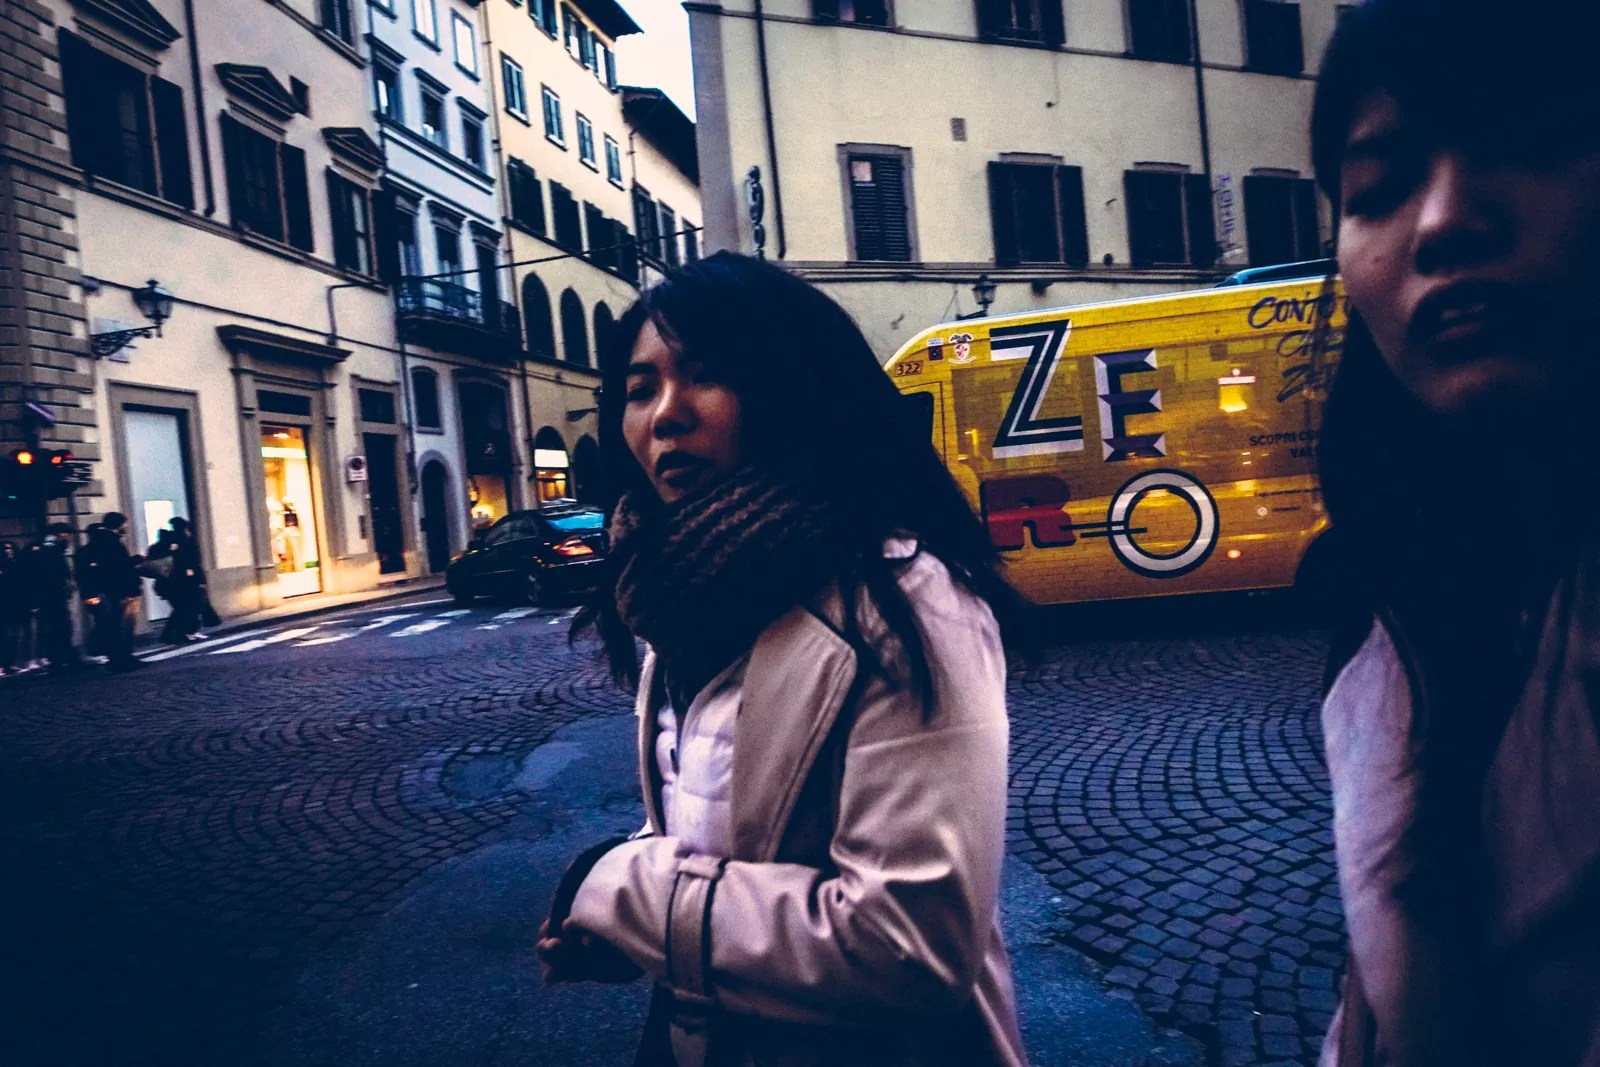 DSCF7805 - Foto fatte a c...? - Pensieri condivisi sulla street photography - fotostreet.it